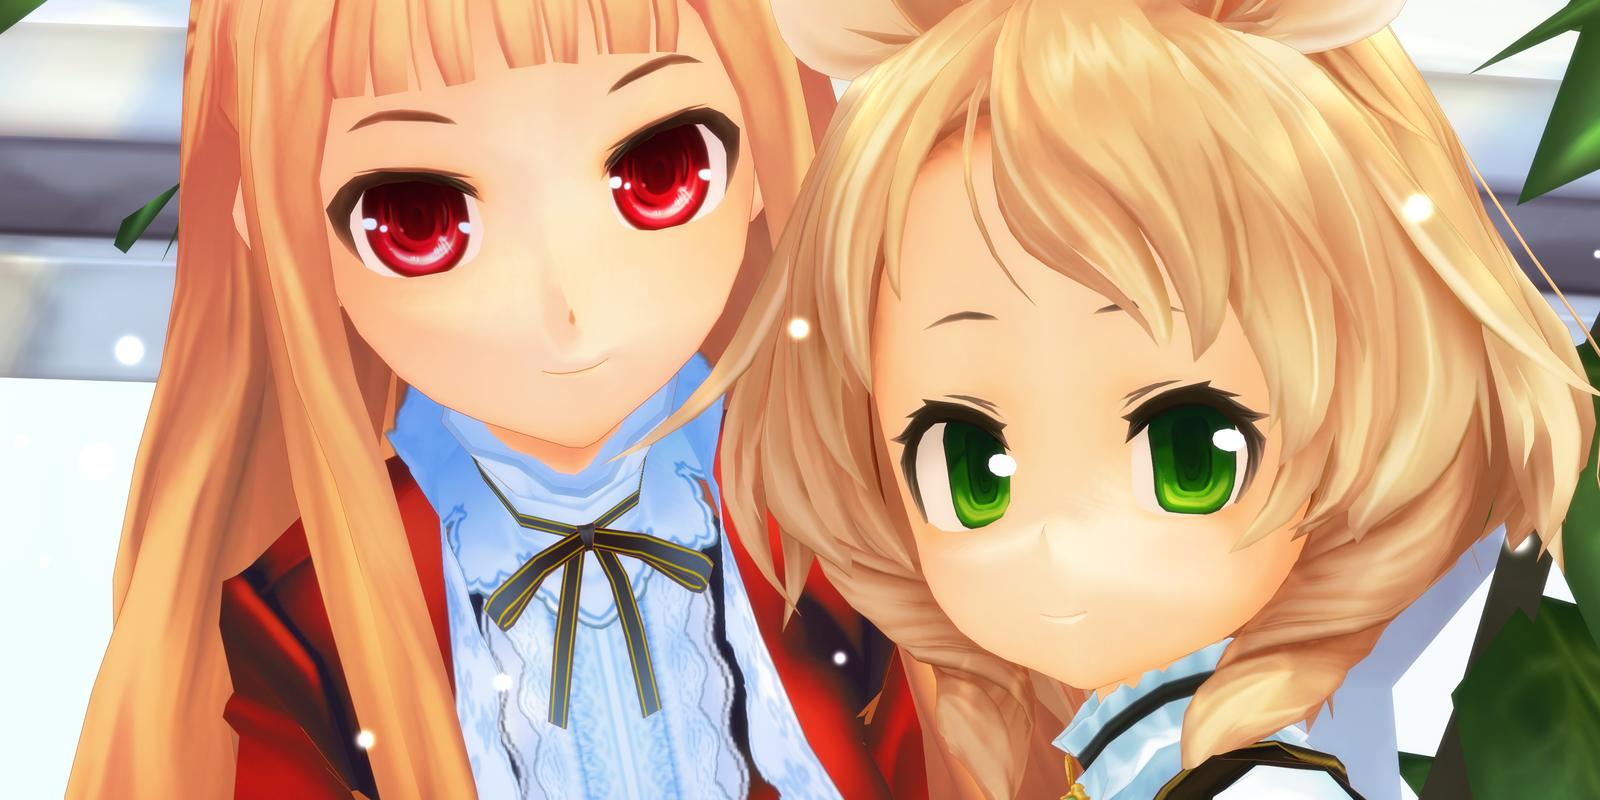 Rhea and Mariel by Aisuchuu